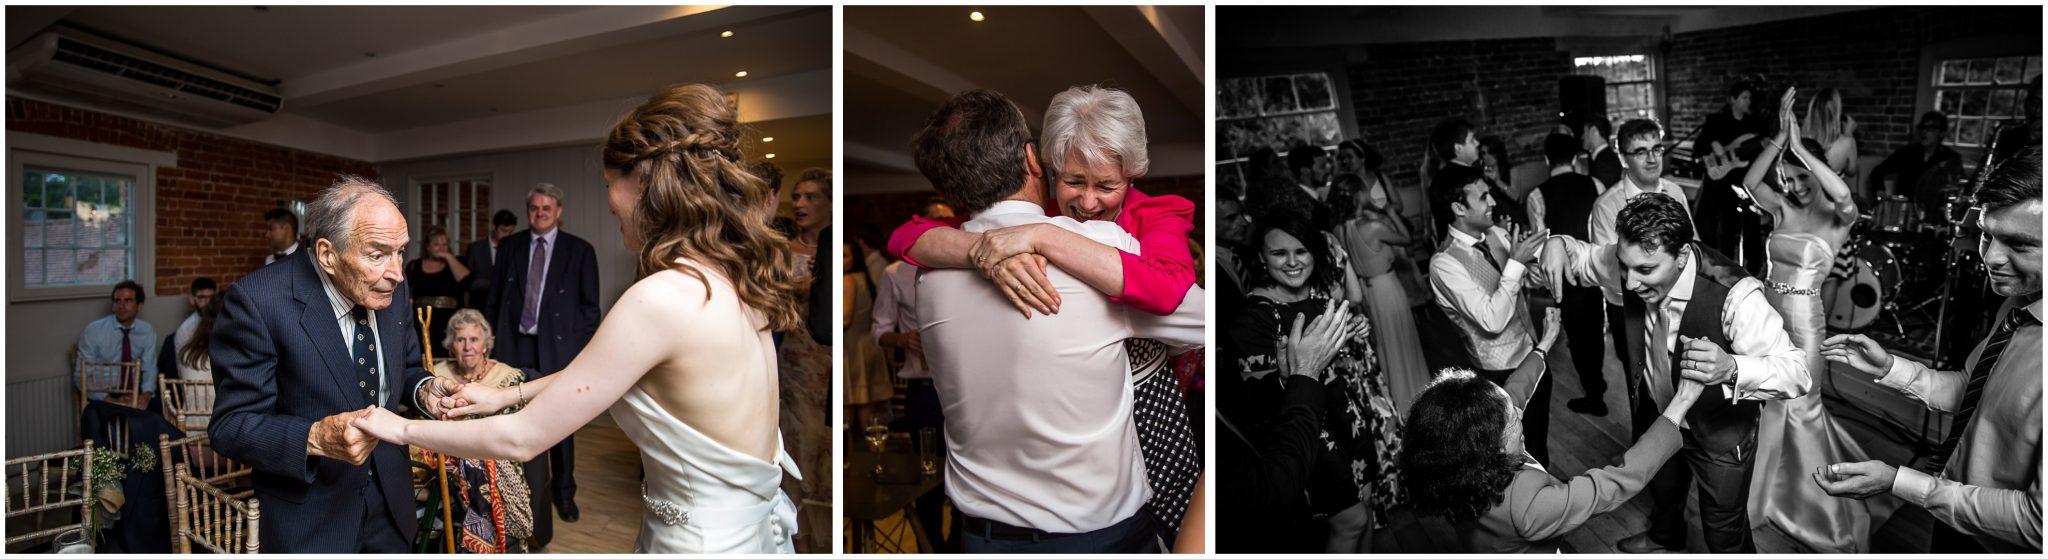 Sopley Mill Summer wedding hugs and kisses